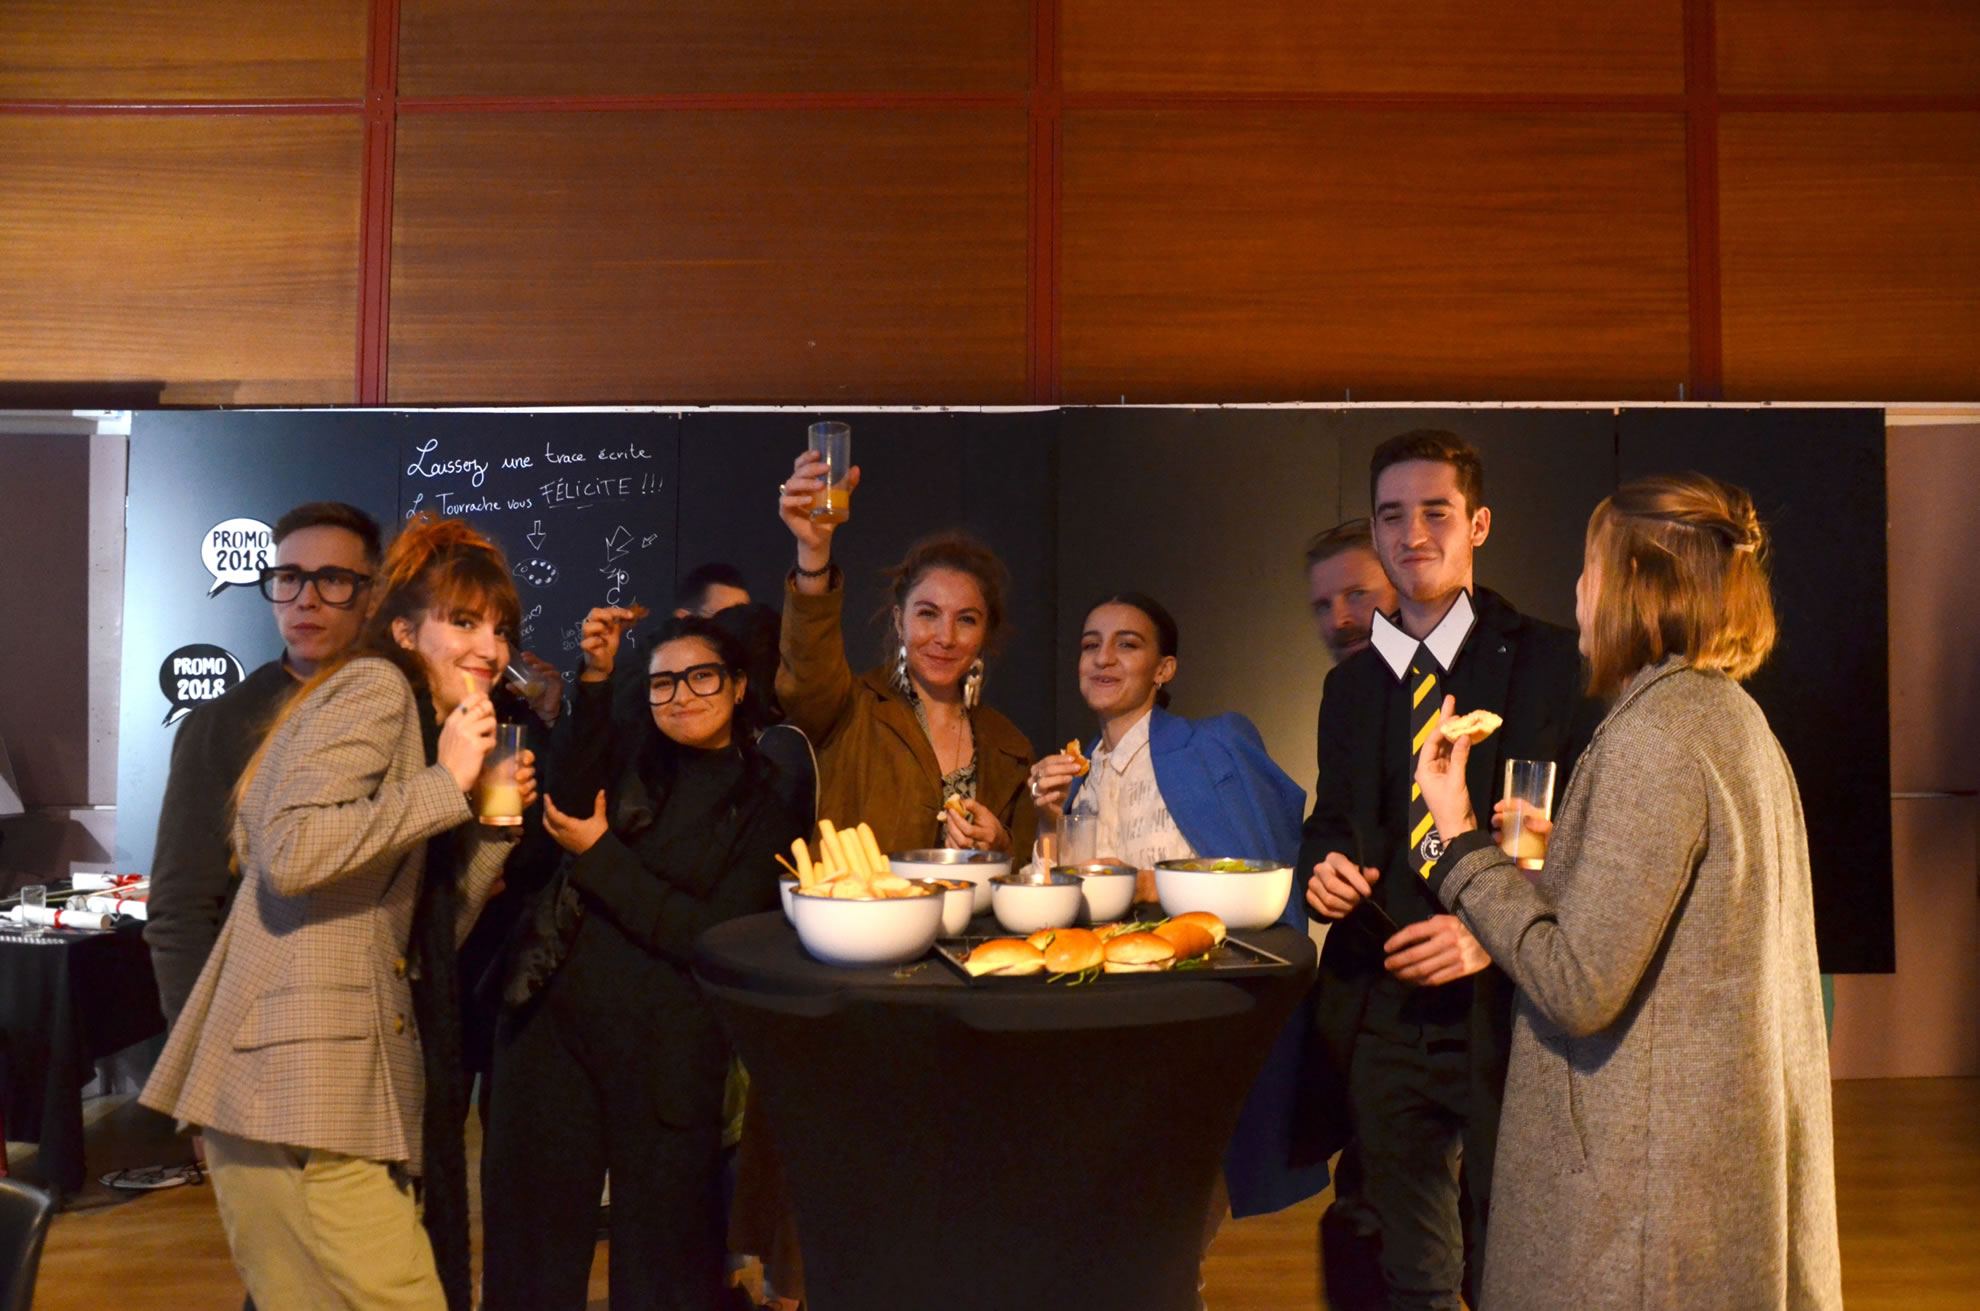 les-diplomes-de-CAPFORMA-et-La-Tourrache (5)